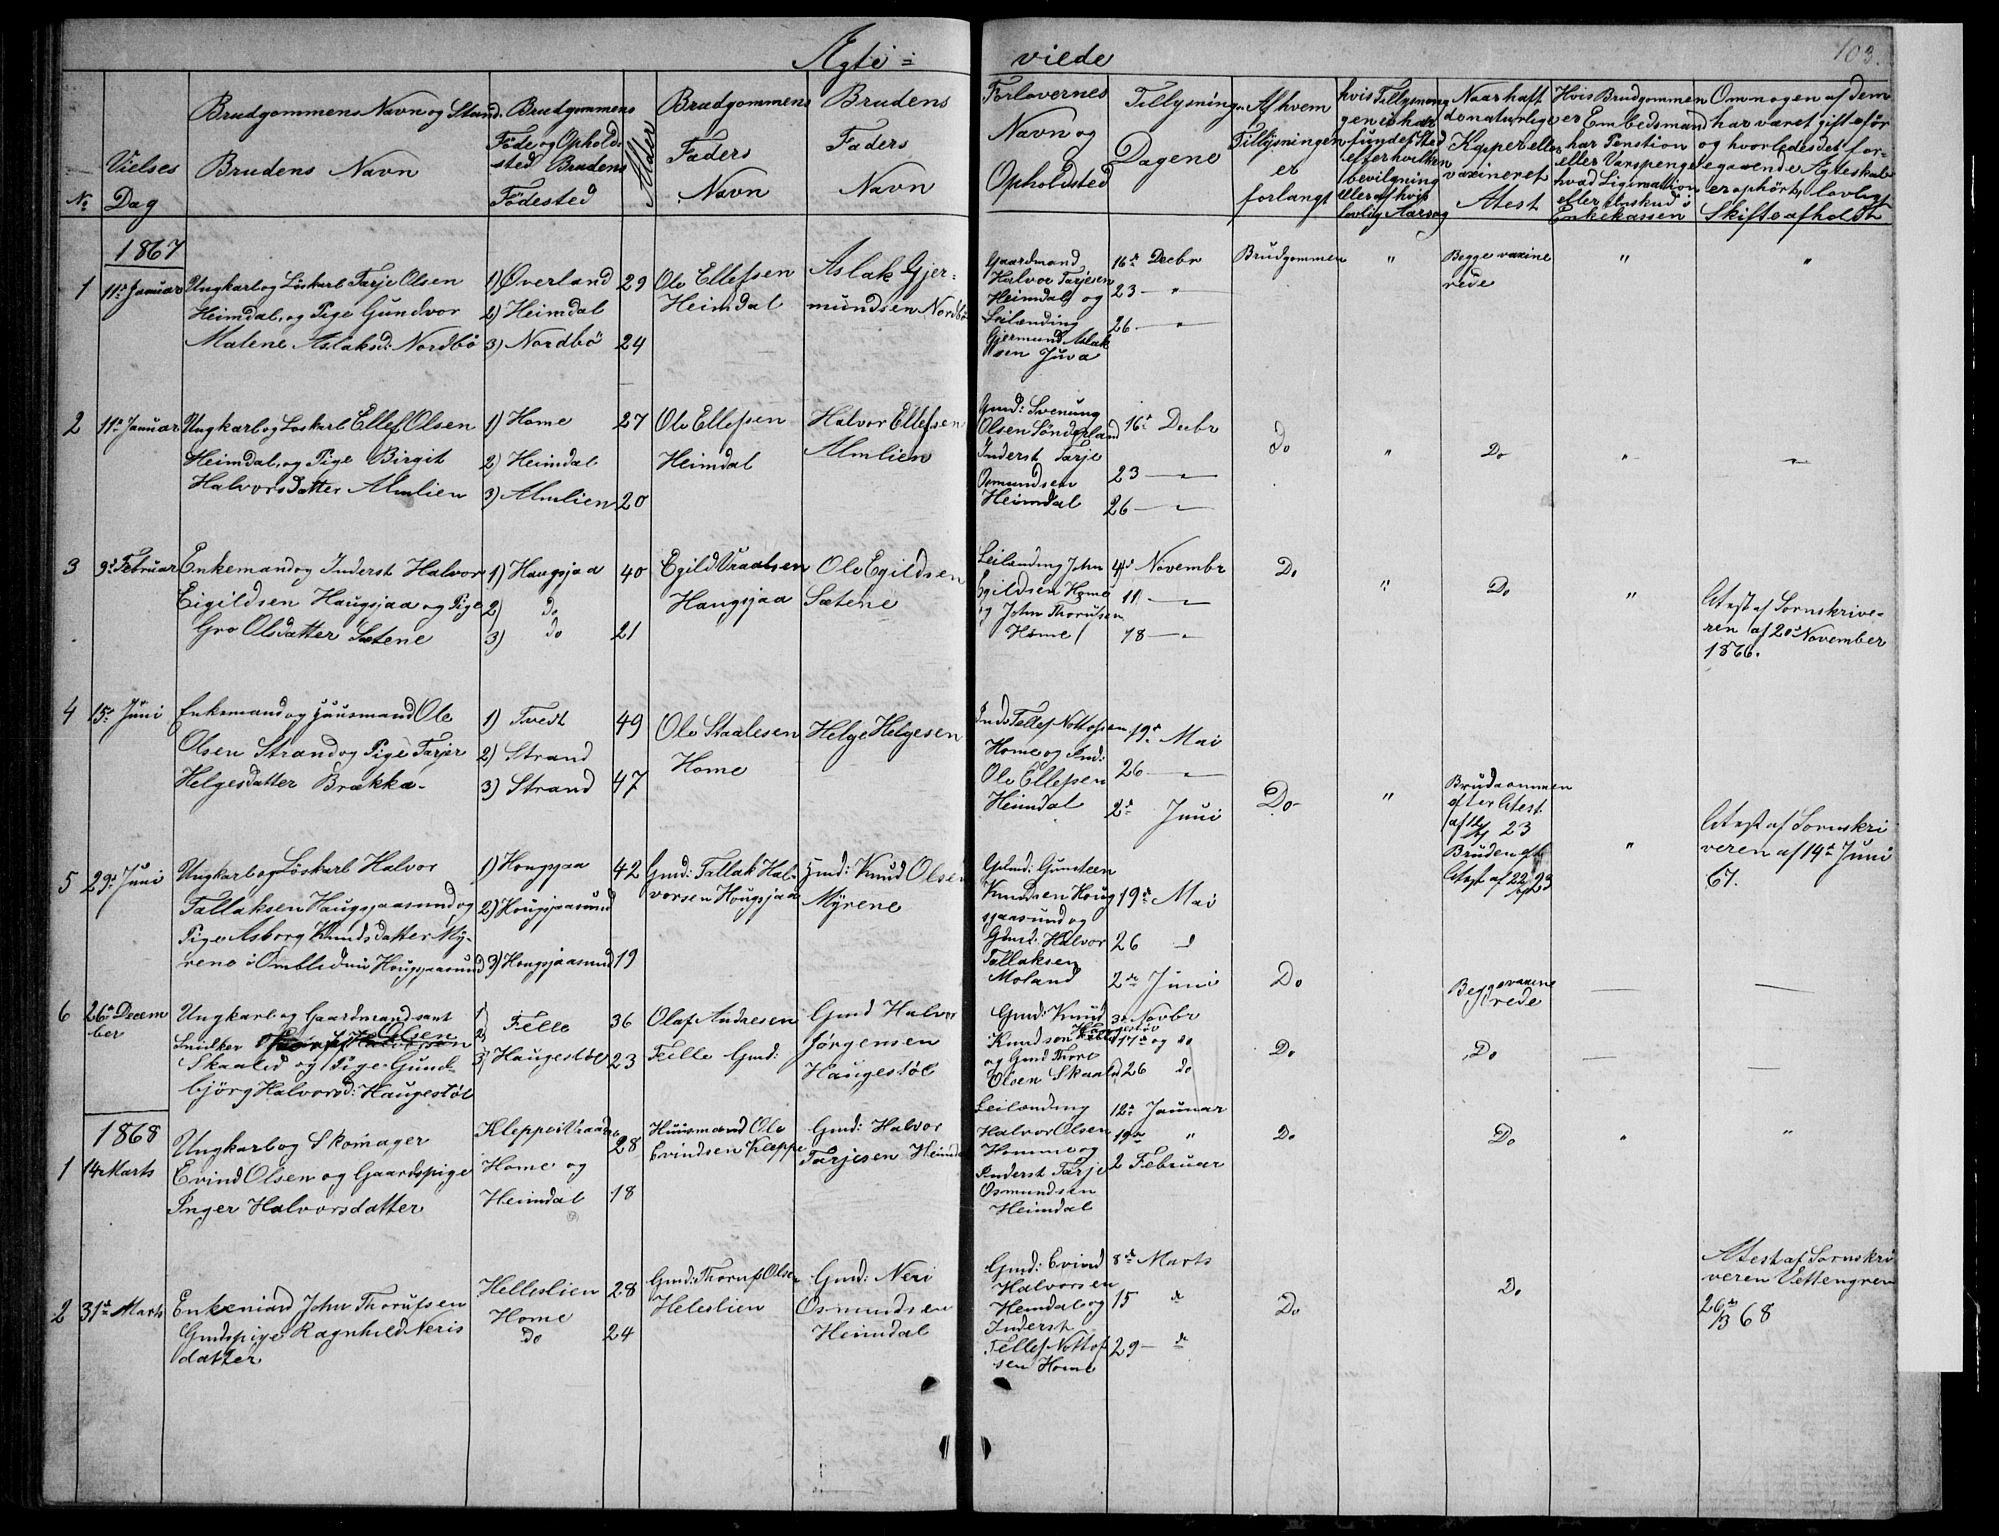 SAKO, Nissedal kirkebøker, G/Gb/L0002: Klokkerbok nr. II 2, 1863-1892, s. 103